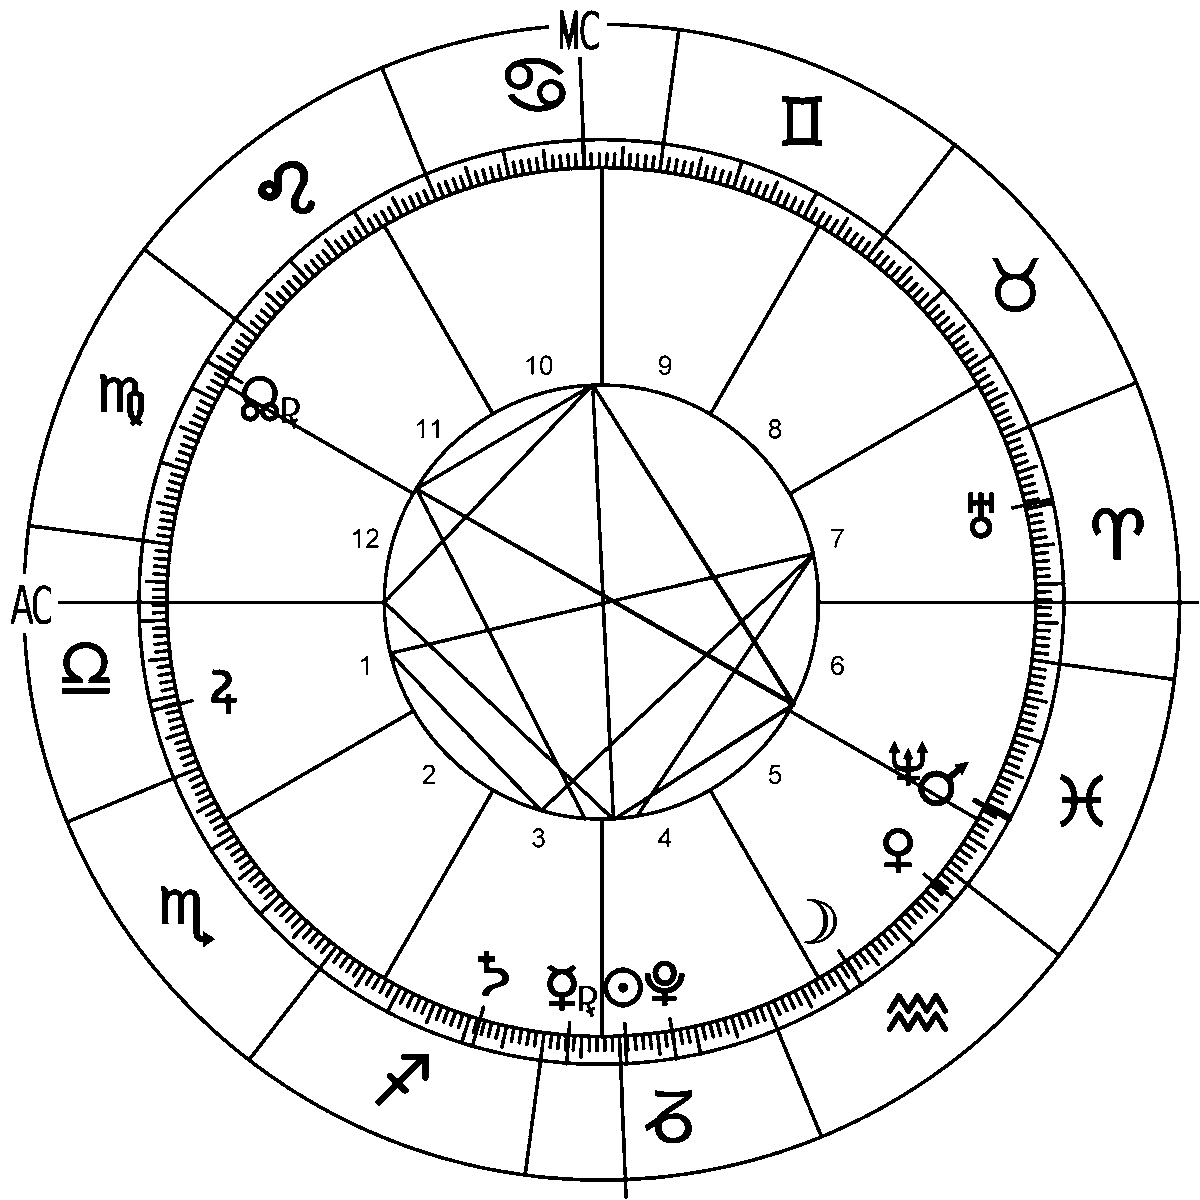 Leo 2017 horoscope zodiac sign astrology the complete 2017 world horoscope chart nvjuhfo Gallery